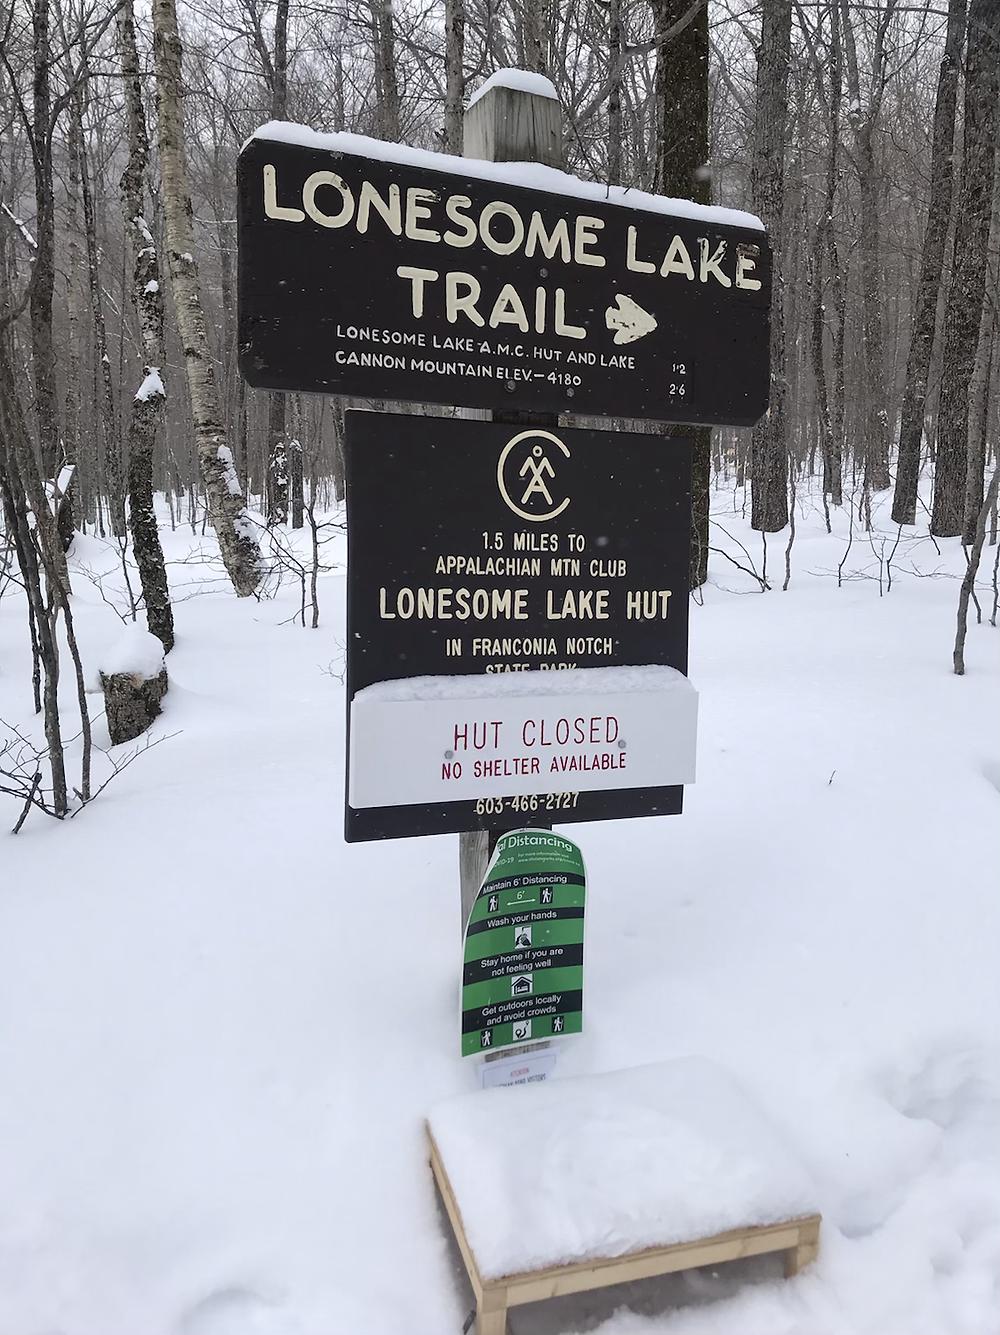 Lonesome Lake Trail Head